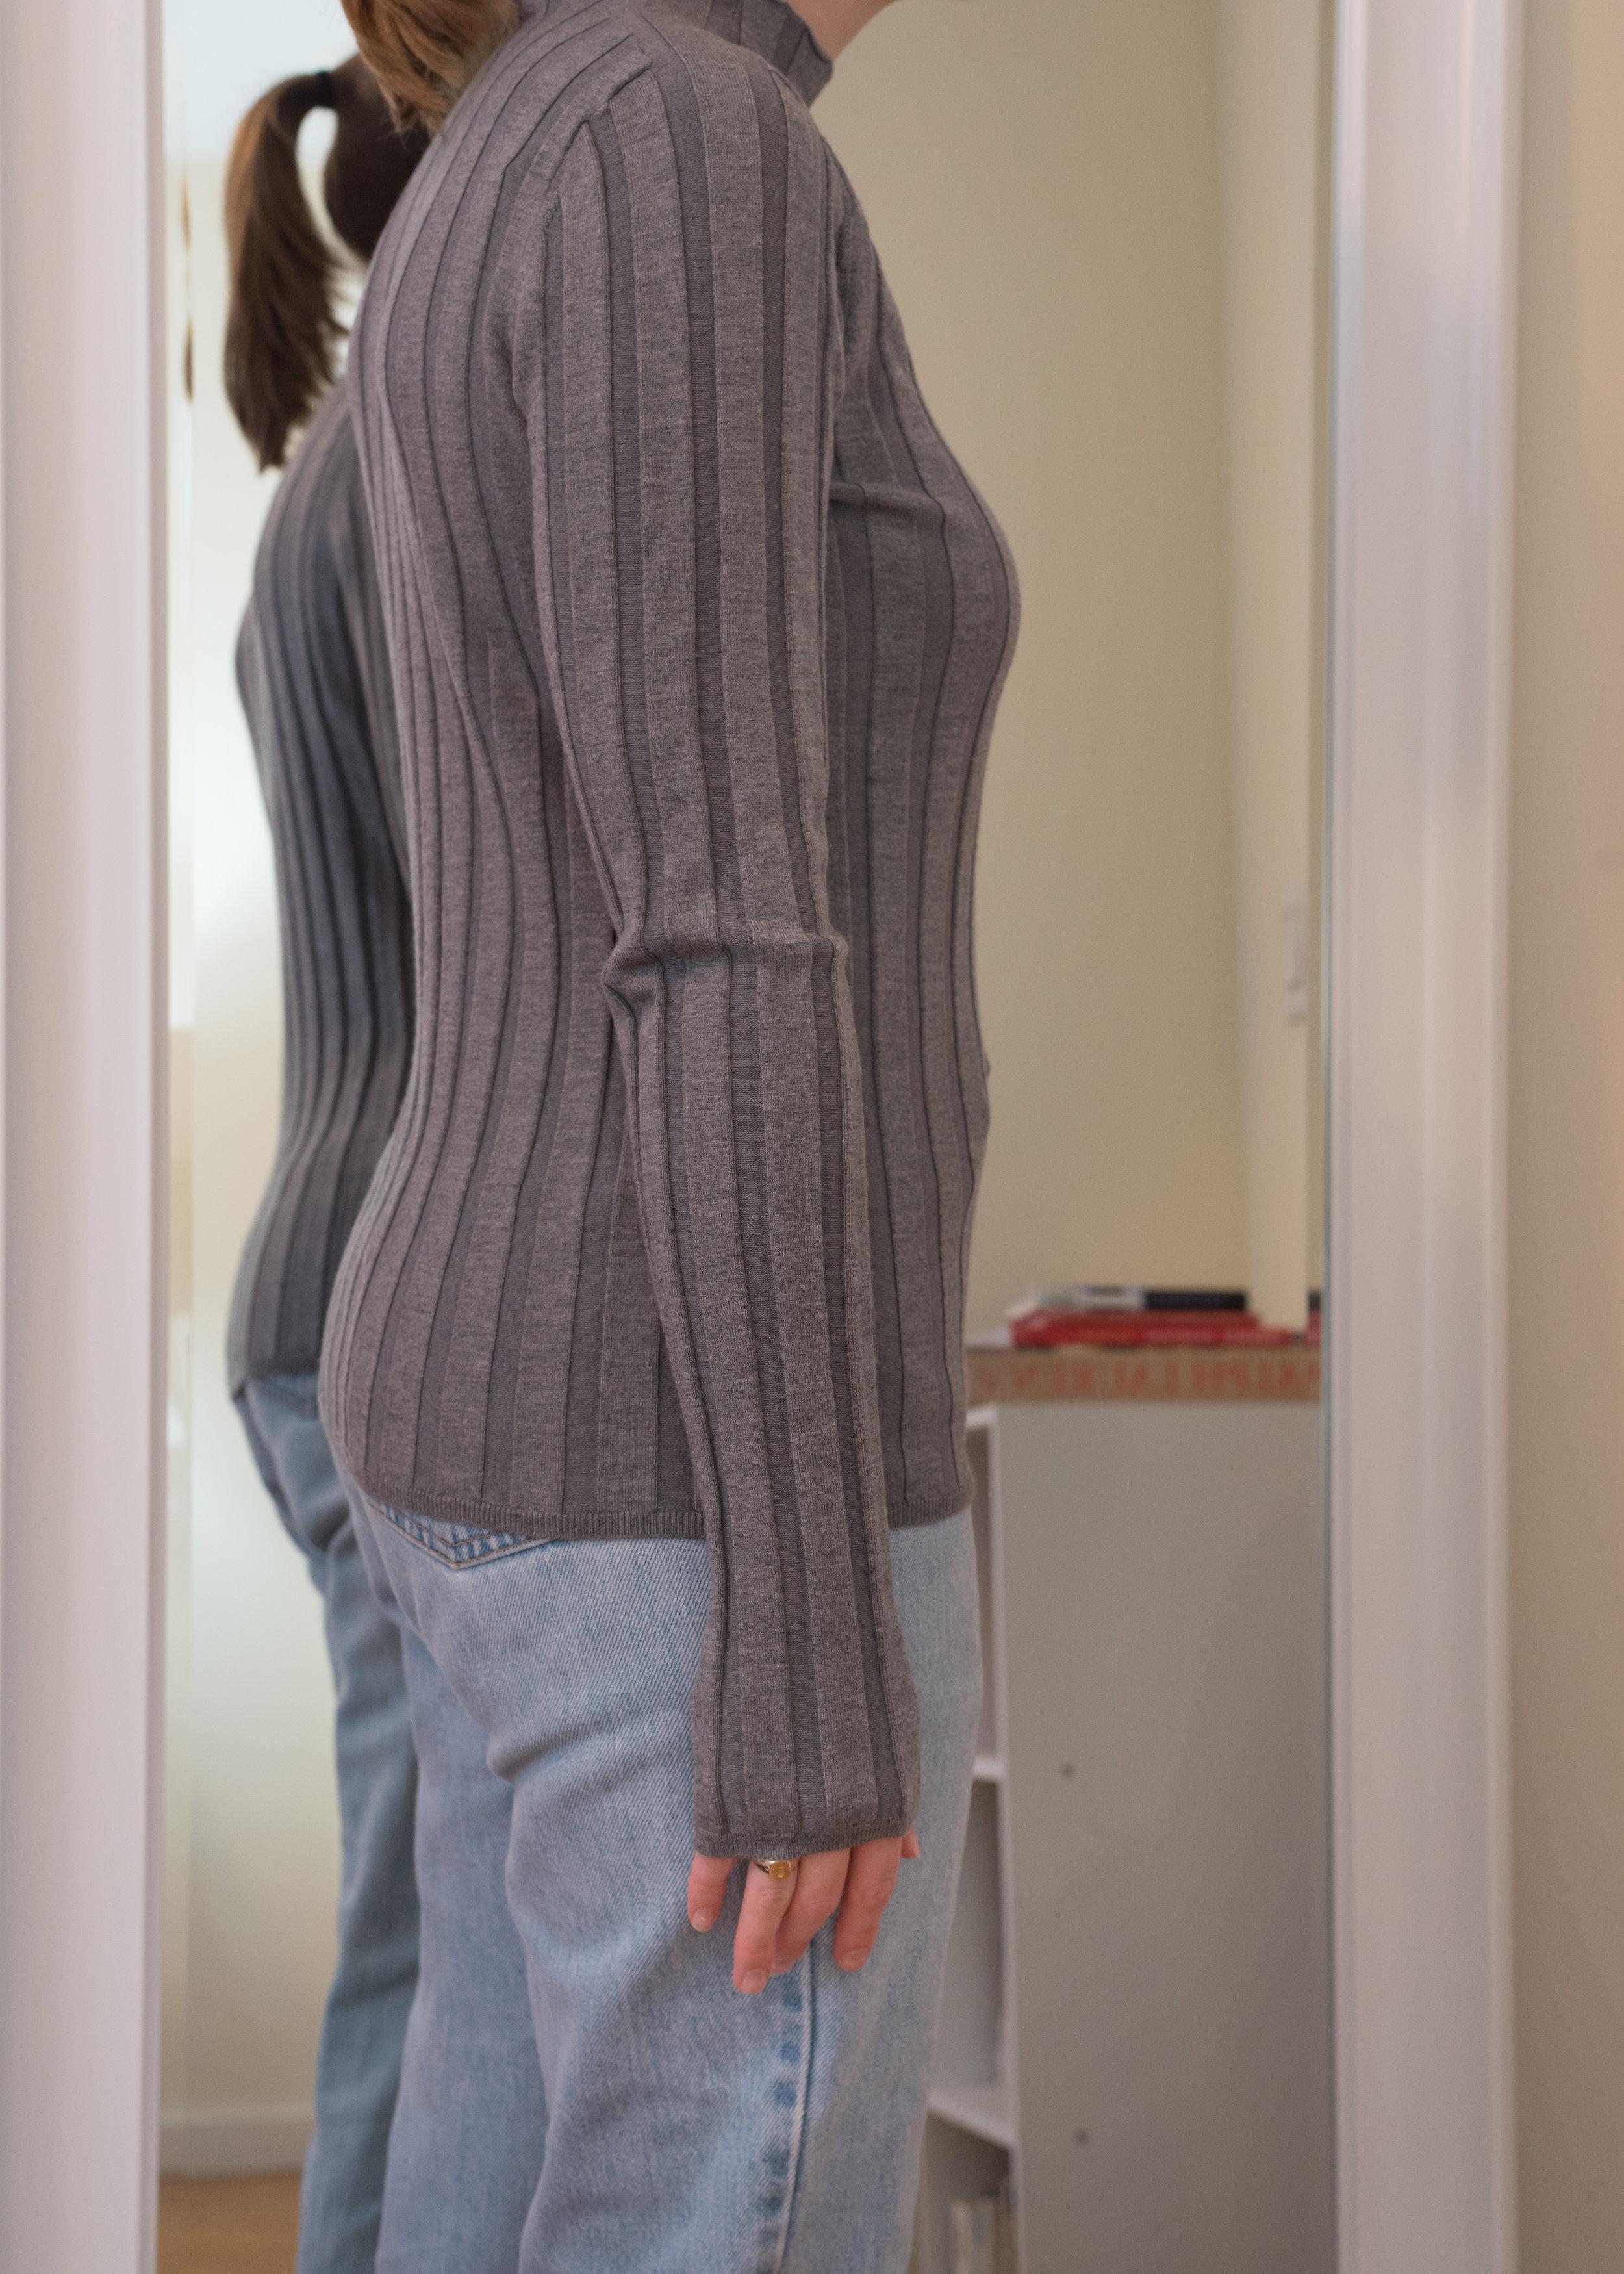 Everlane Luxe Wool Rib Mockneck Sweater - Side View